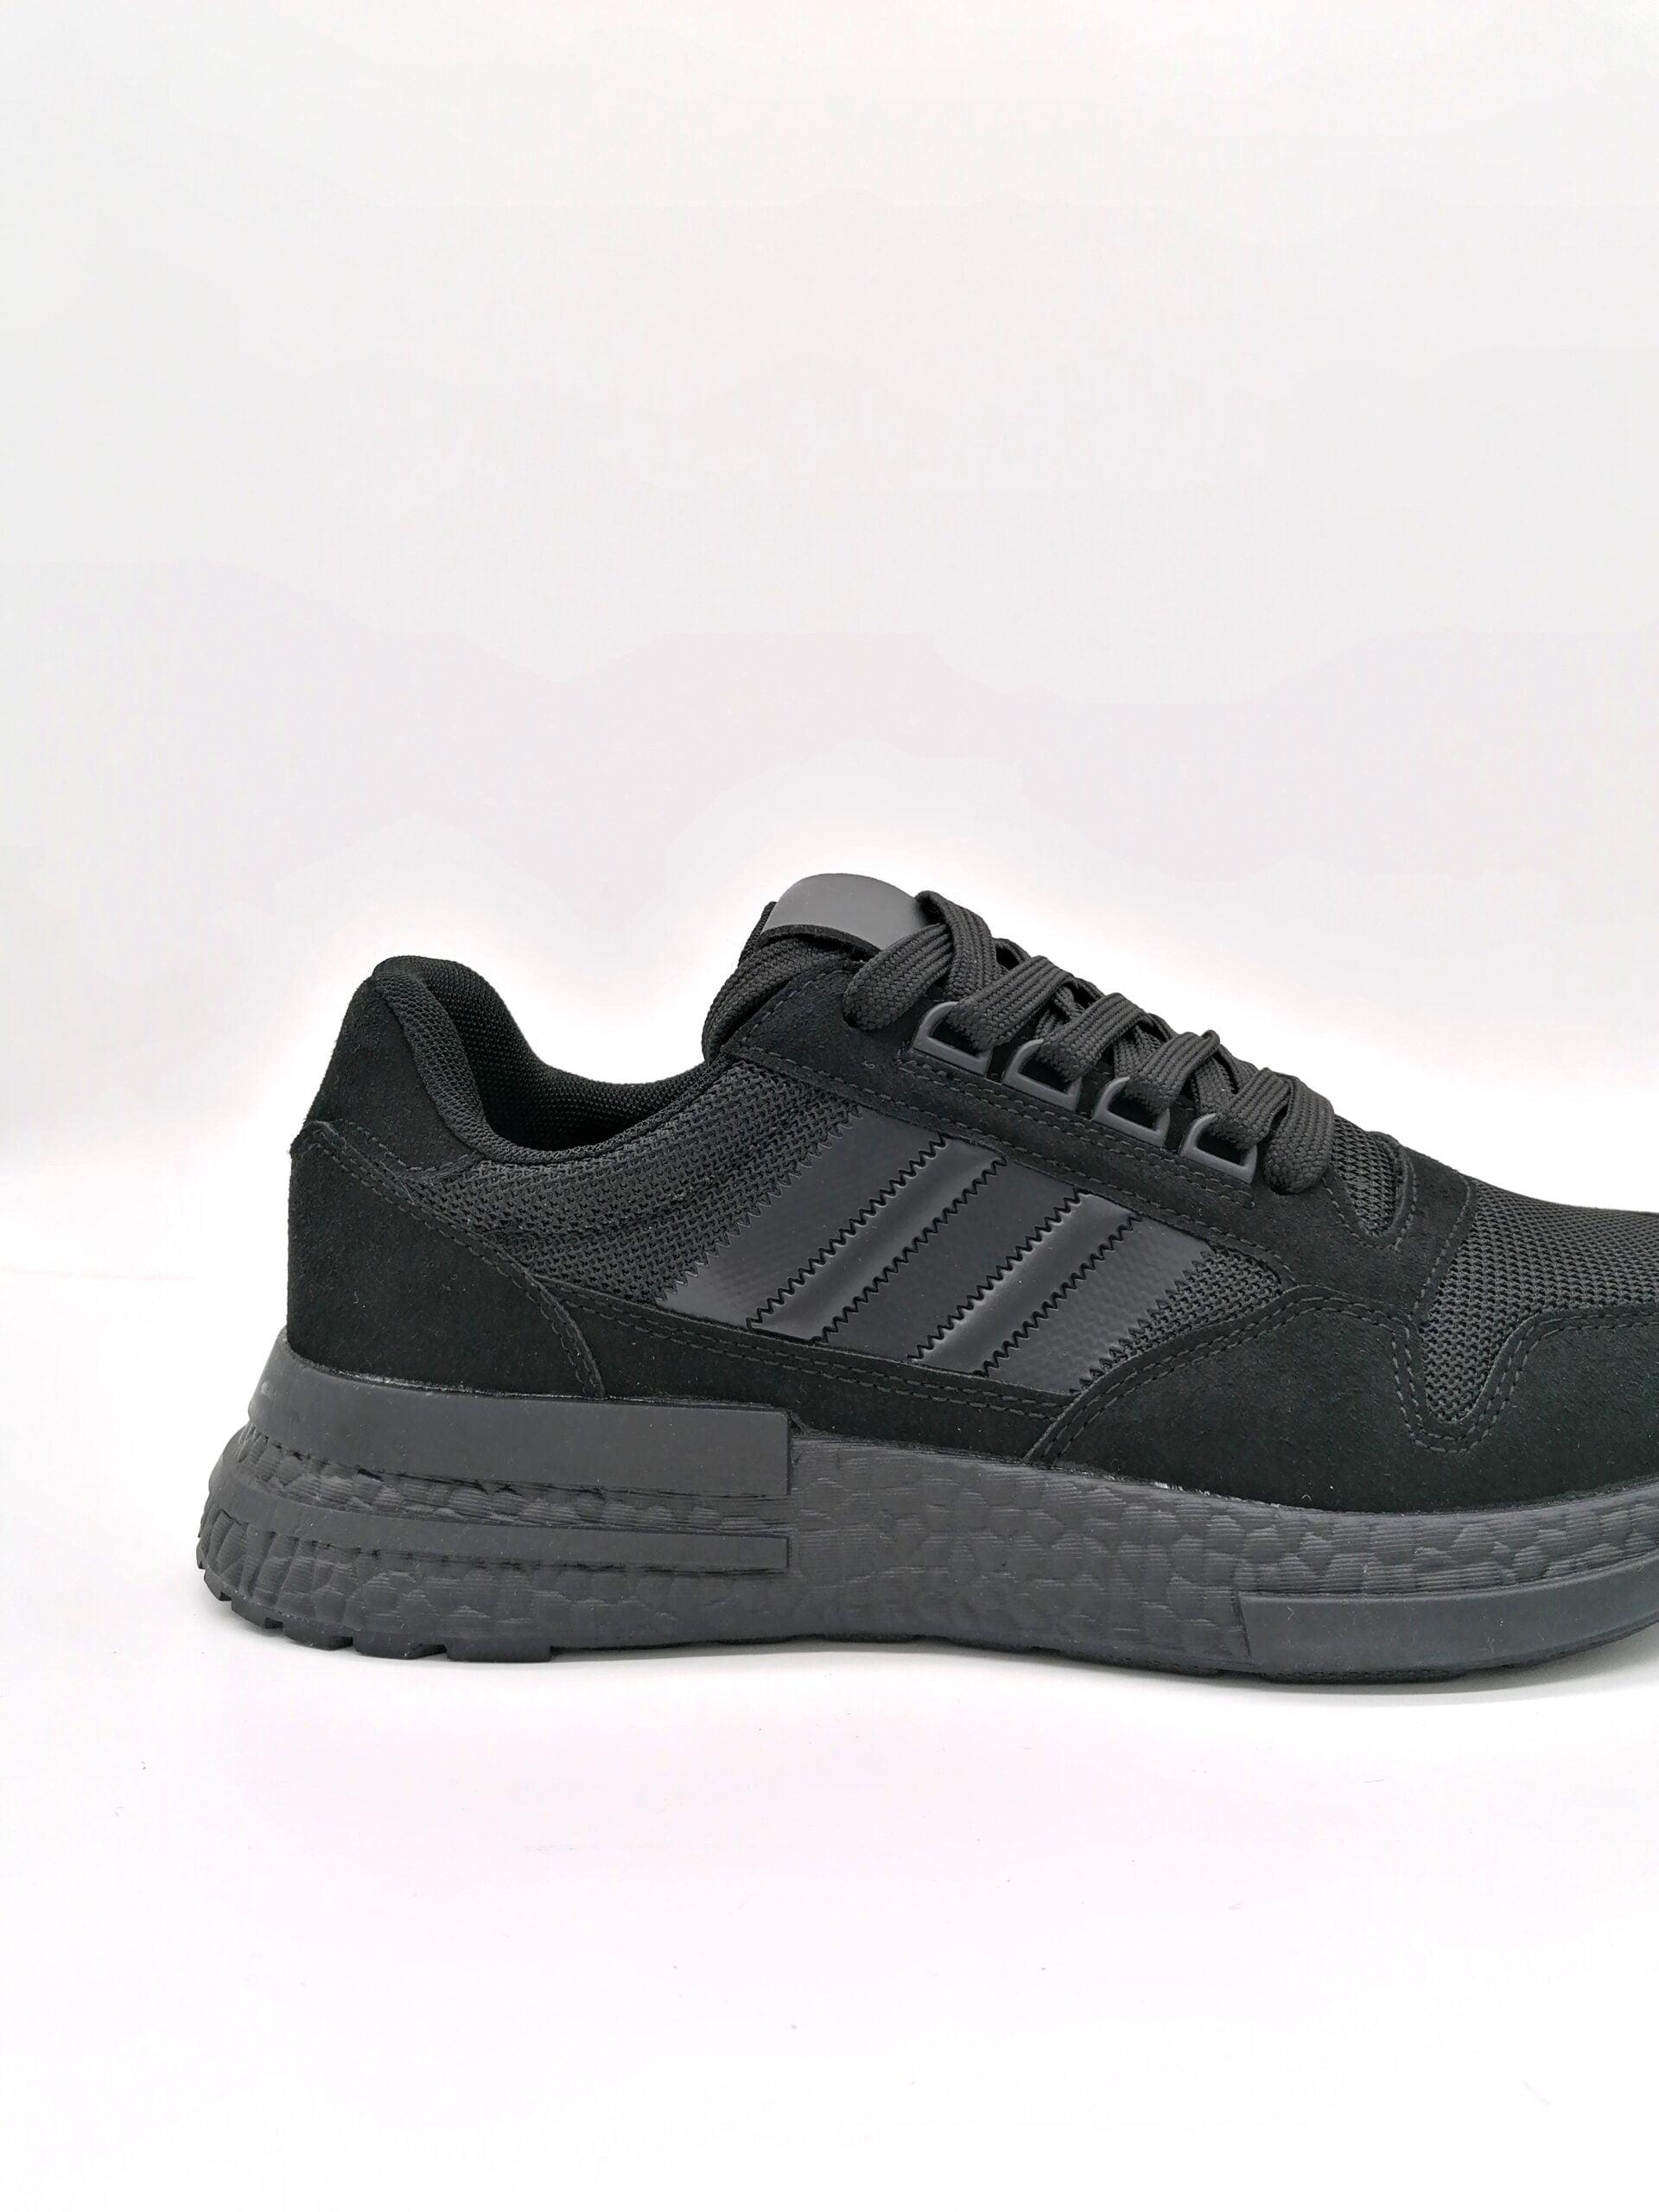 Sports shoe all Black